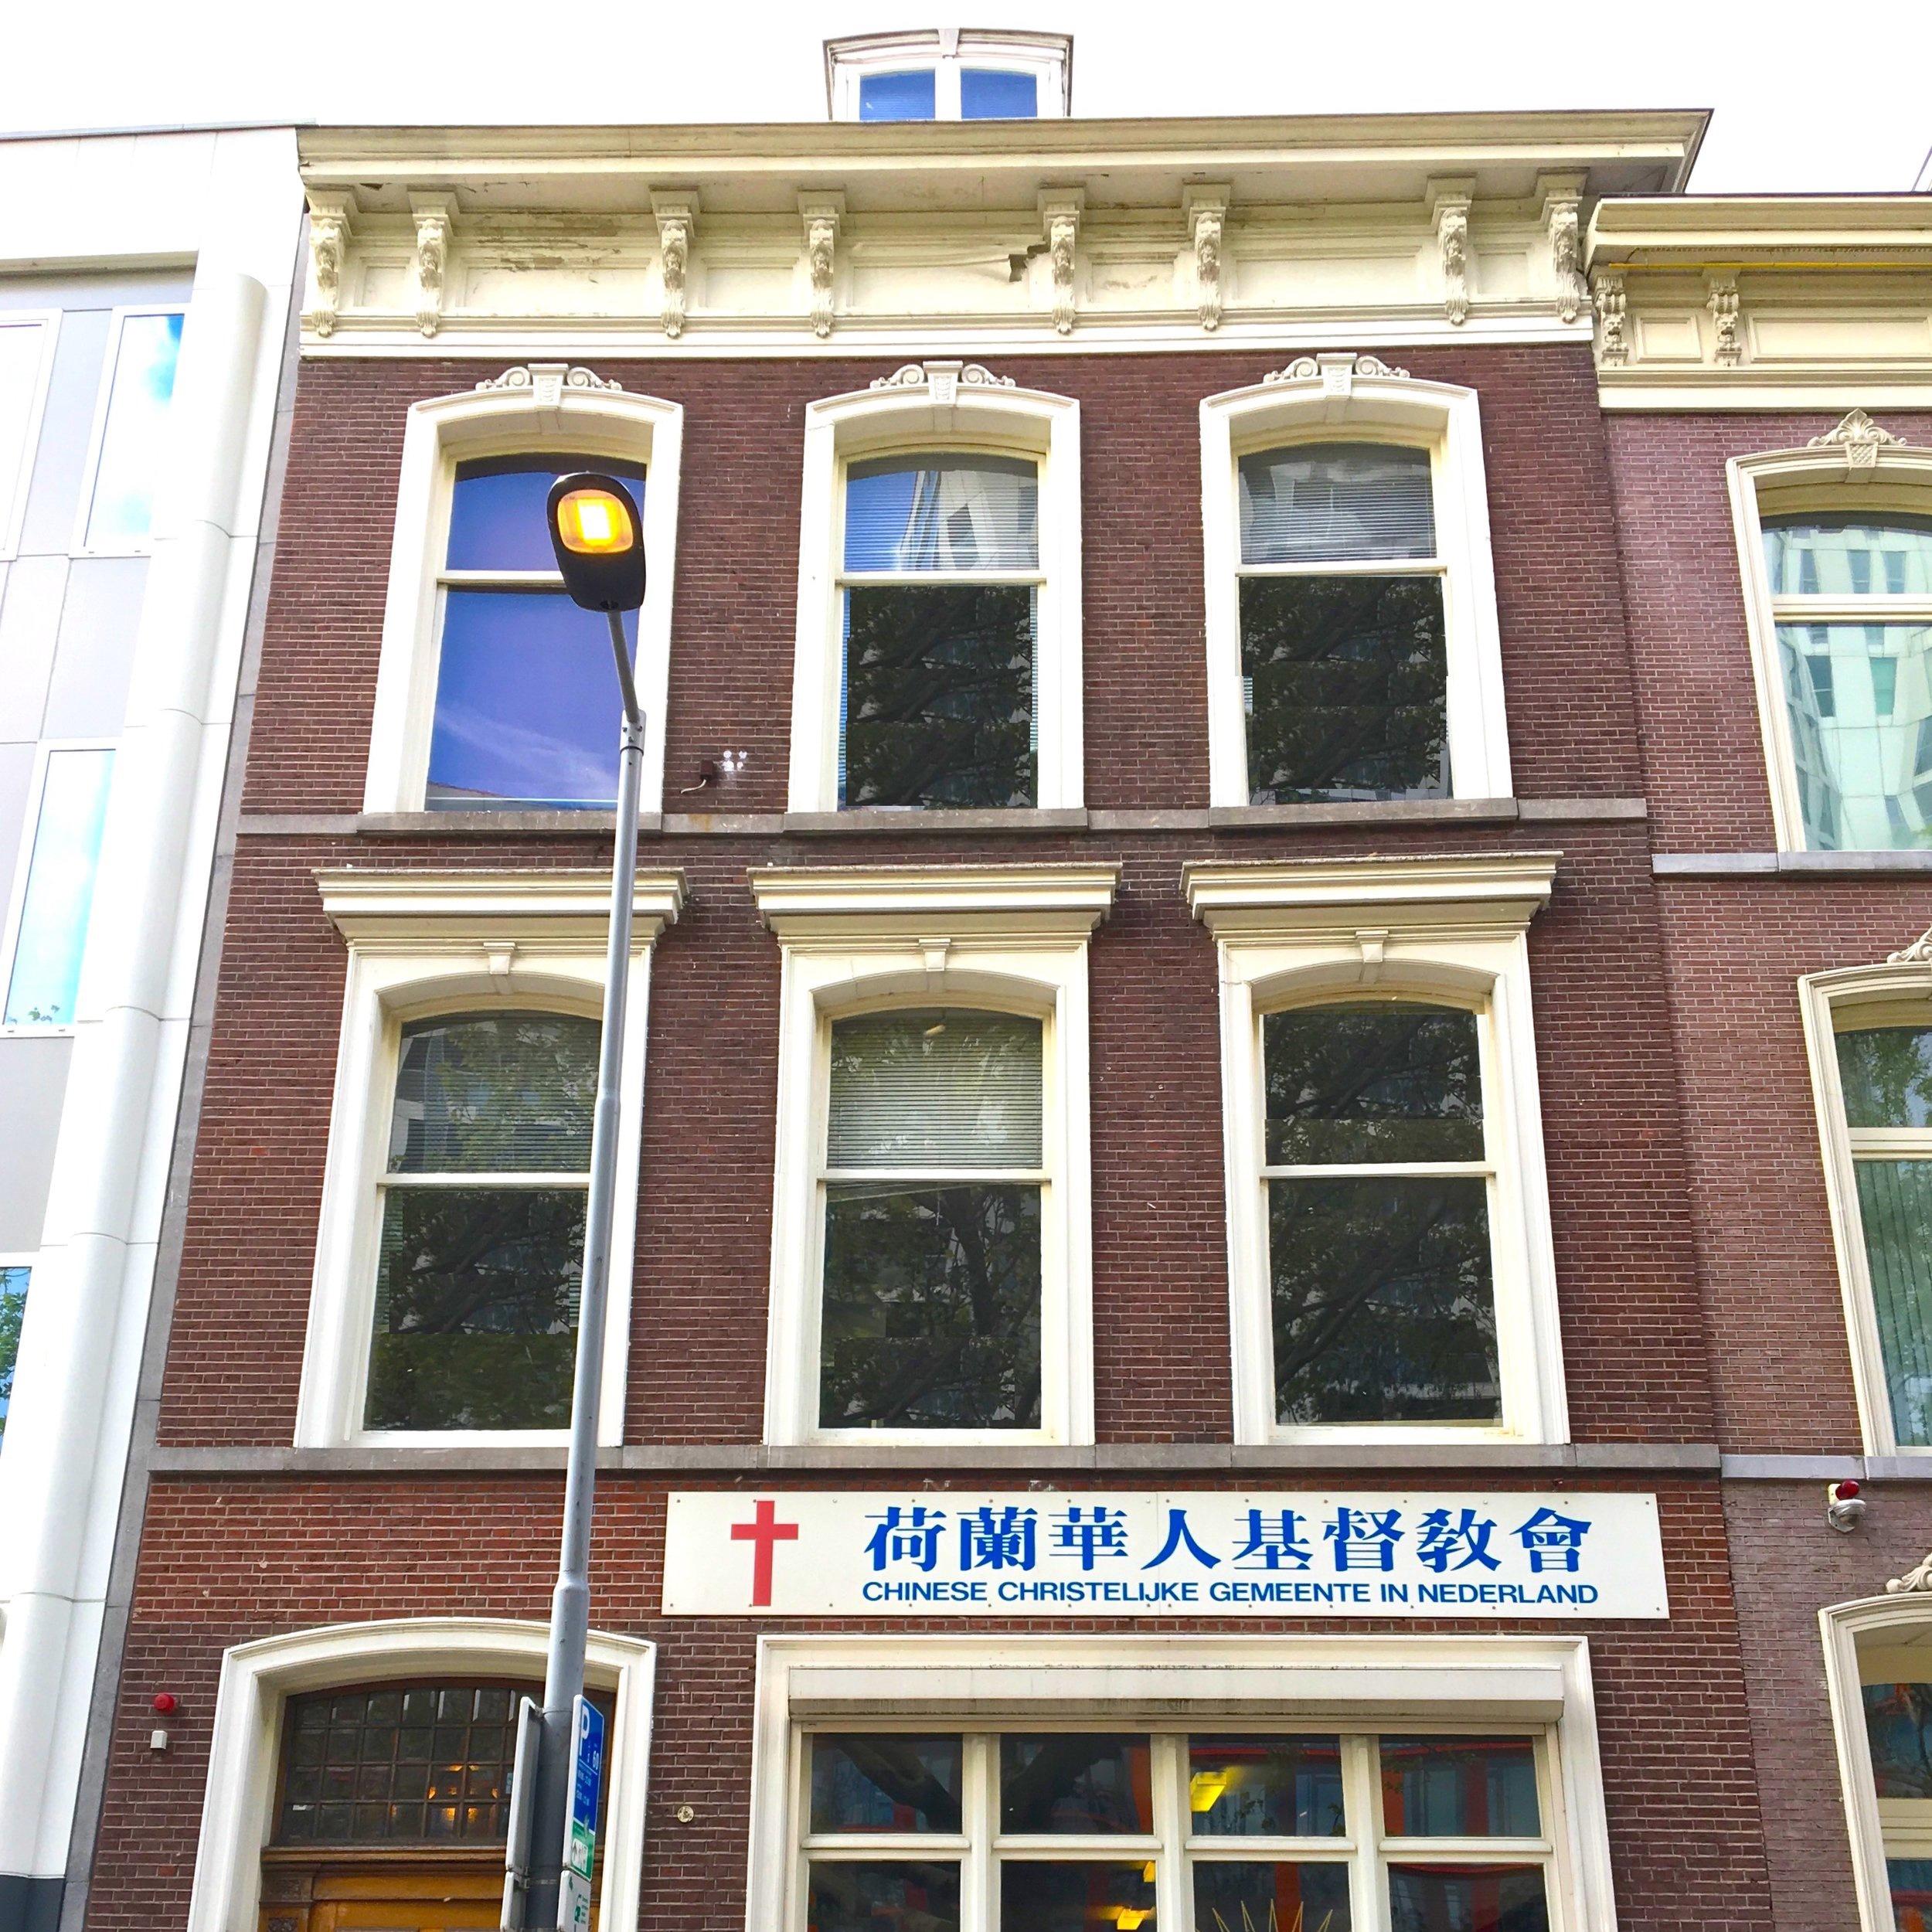 CCGN Rotterdam 鹿特丹堂  Westersingel 10  3014 GM Rotterdam   Kerkdienst : elke zondag om 10.00 uur  Nederlandstalige kerkdienst : elke zondag om 12:30 uur